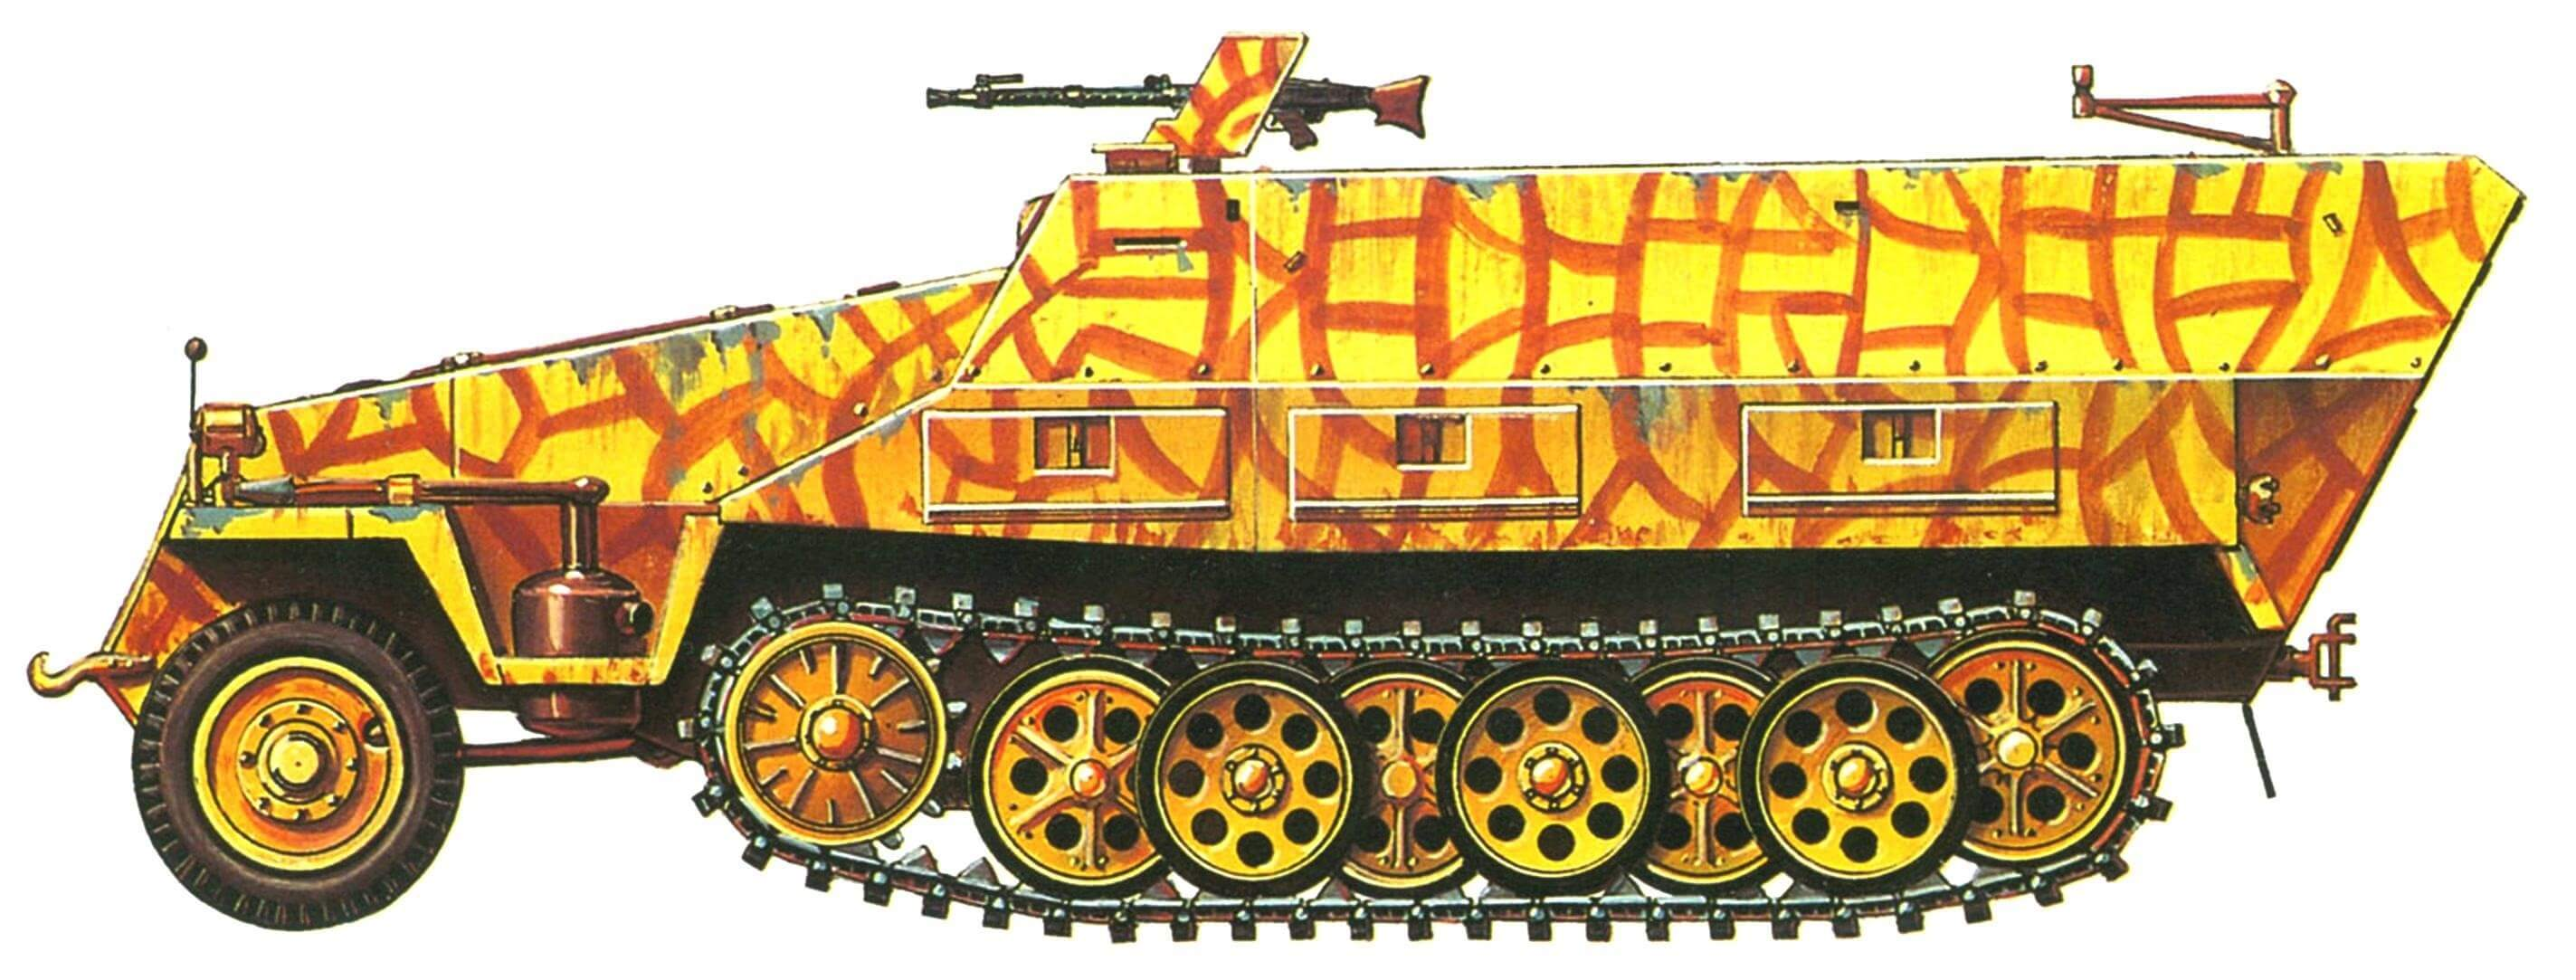 "Sd.Kfz.251/1 Ausf.D. Воздушно-десантная танковая дивизия ''Герман Геринг"" (Fallschirm Panzer Division ''Herman Goering""), Италия, Монте-Кассино, 1943 - 44 г.г."